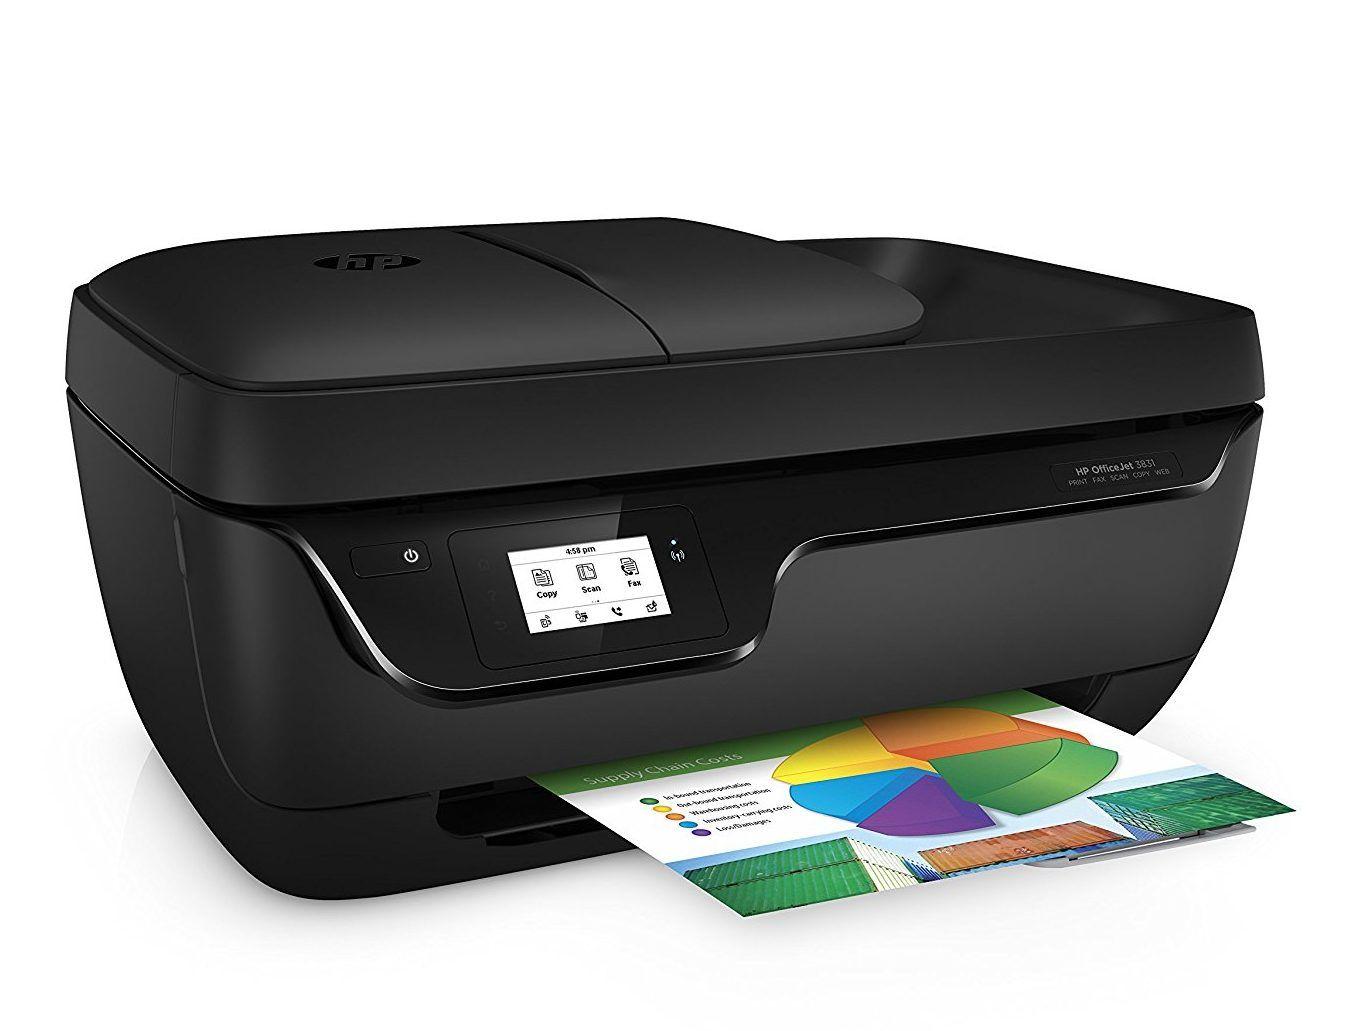 impresoras multifuncion baratas